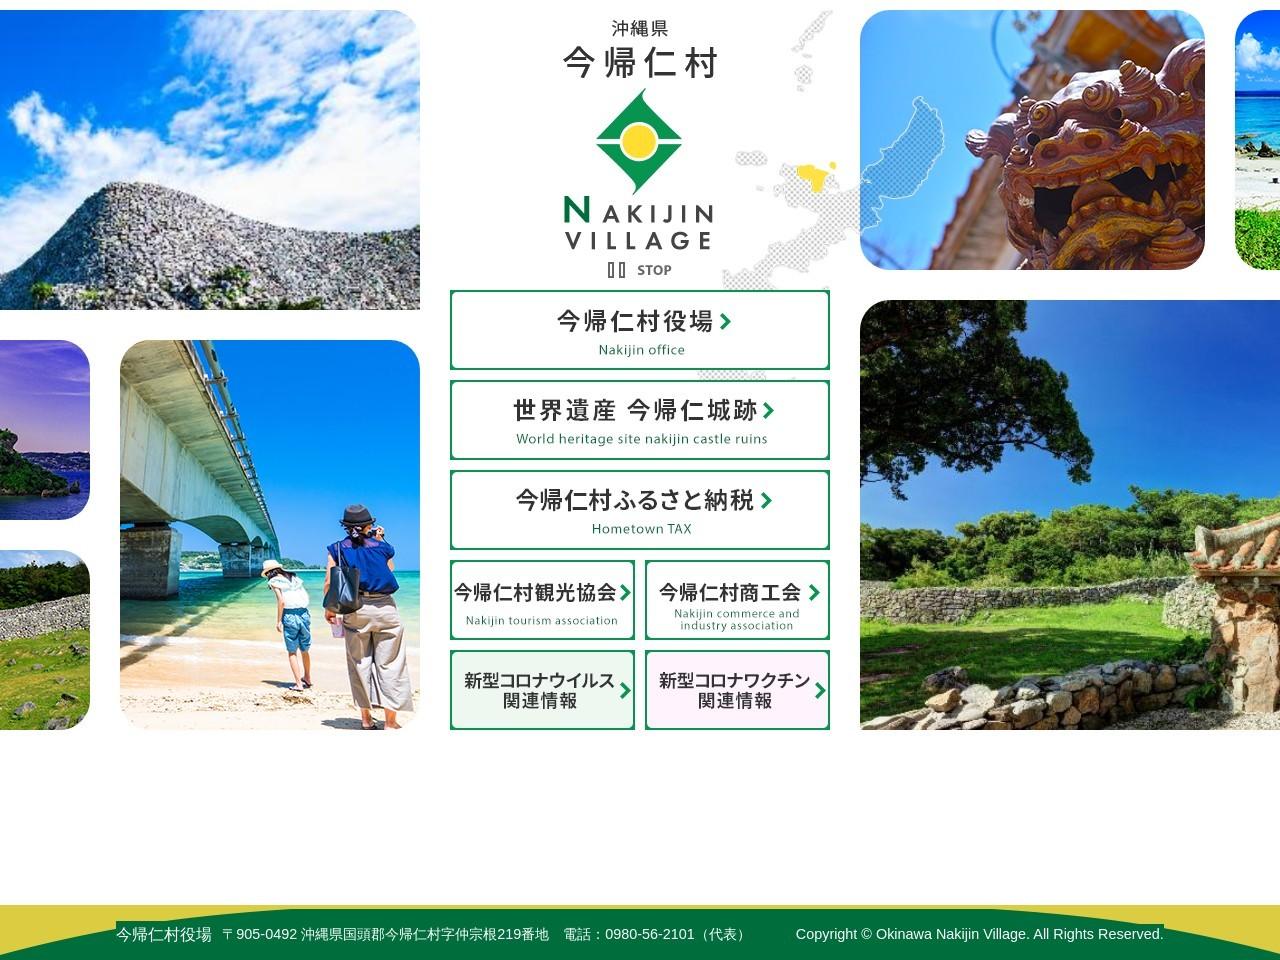 http://www.nakijin.jp/nakijin.nsf/doc/7?OpenDocument